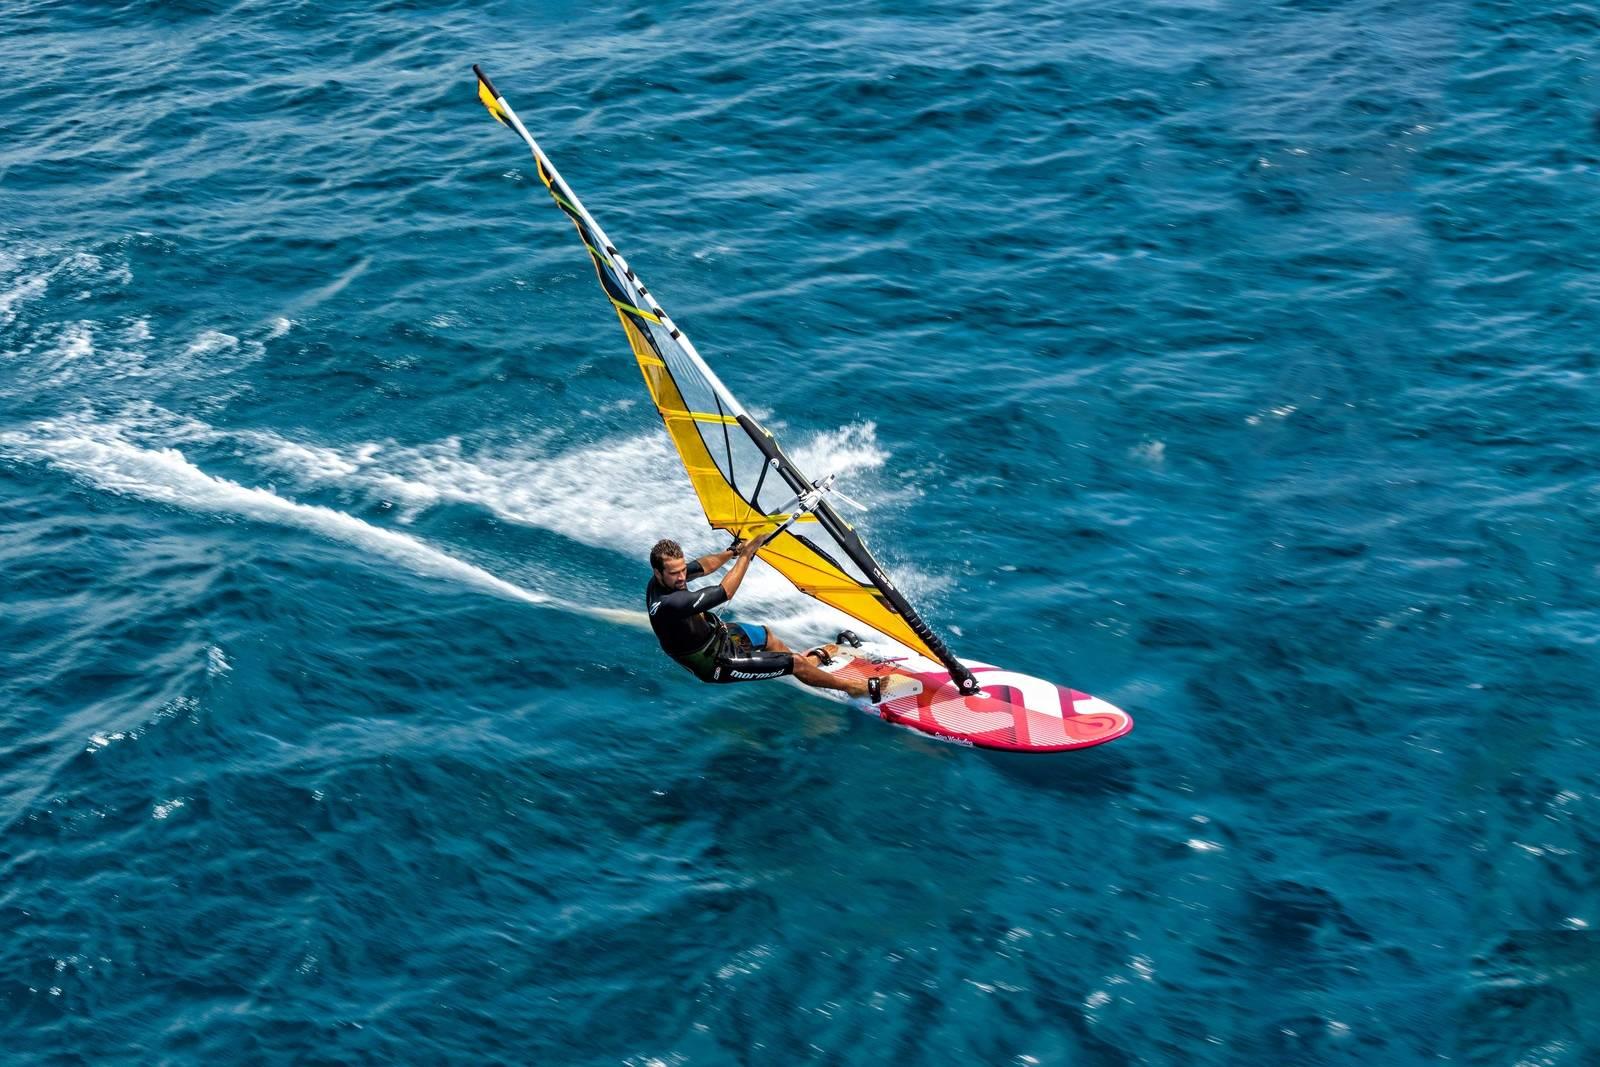 Plane windsurfing